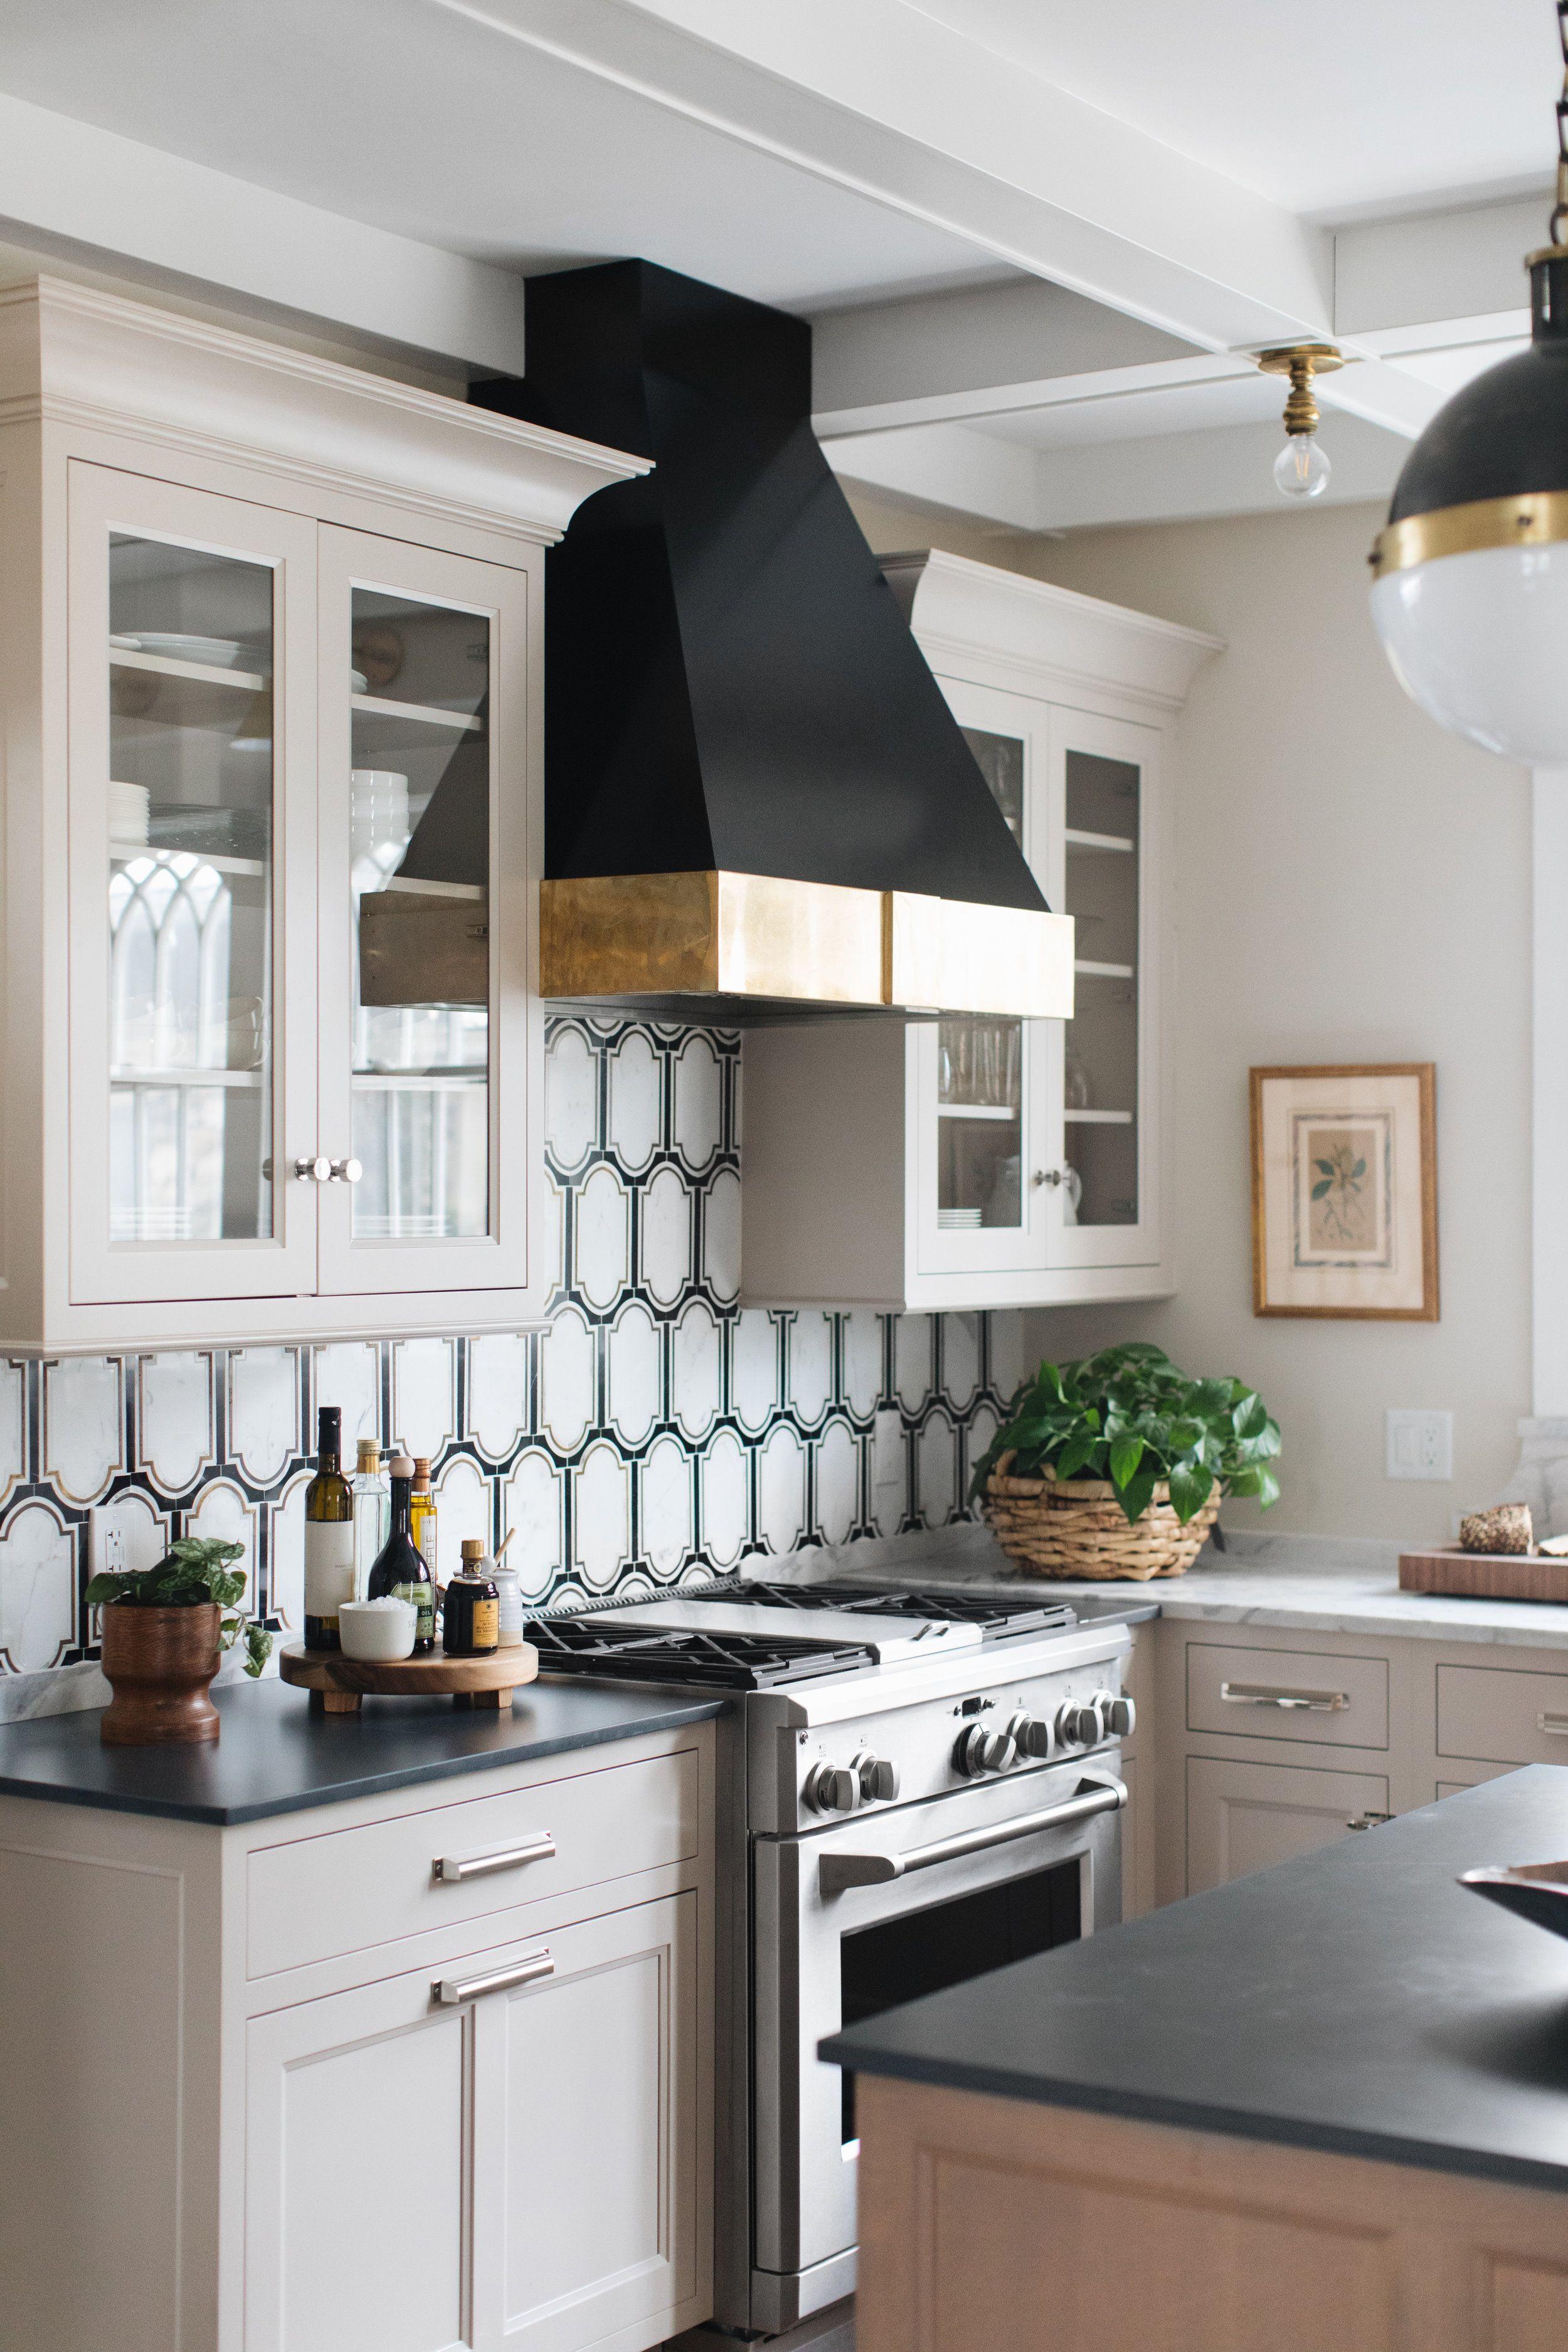 Jean Stoffer Design Taupe Kitchen Glass Fronted Kitchen Cabinets New Kitchen Cabinets